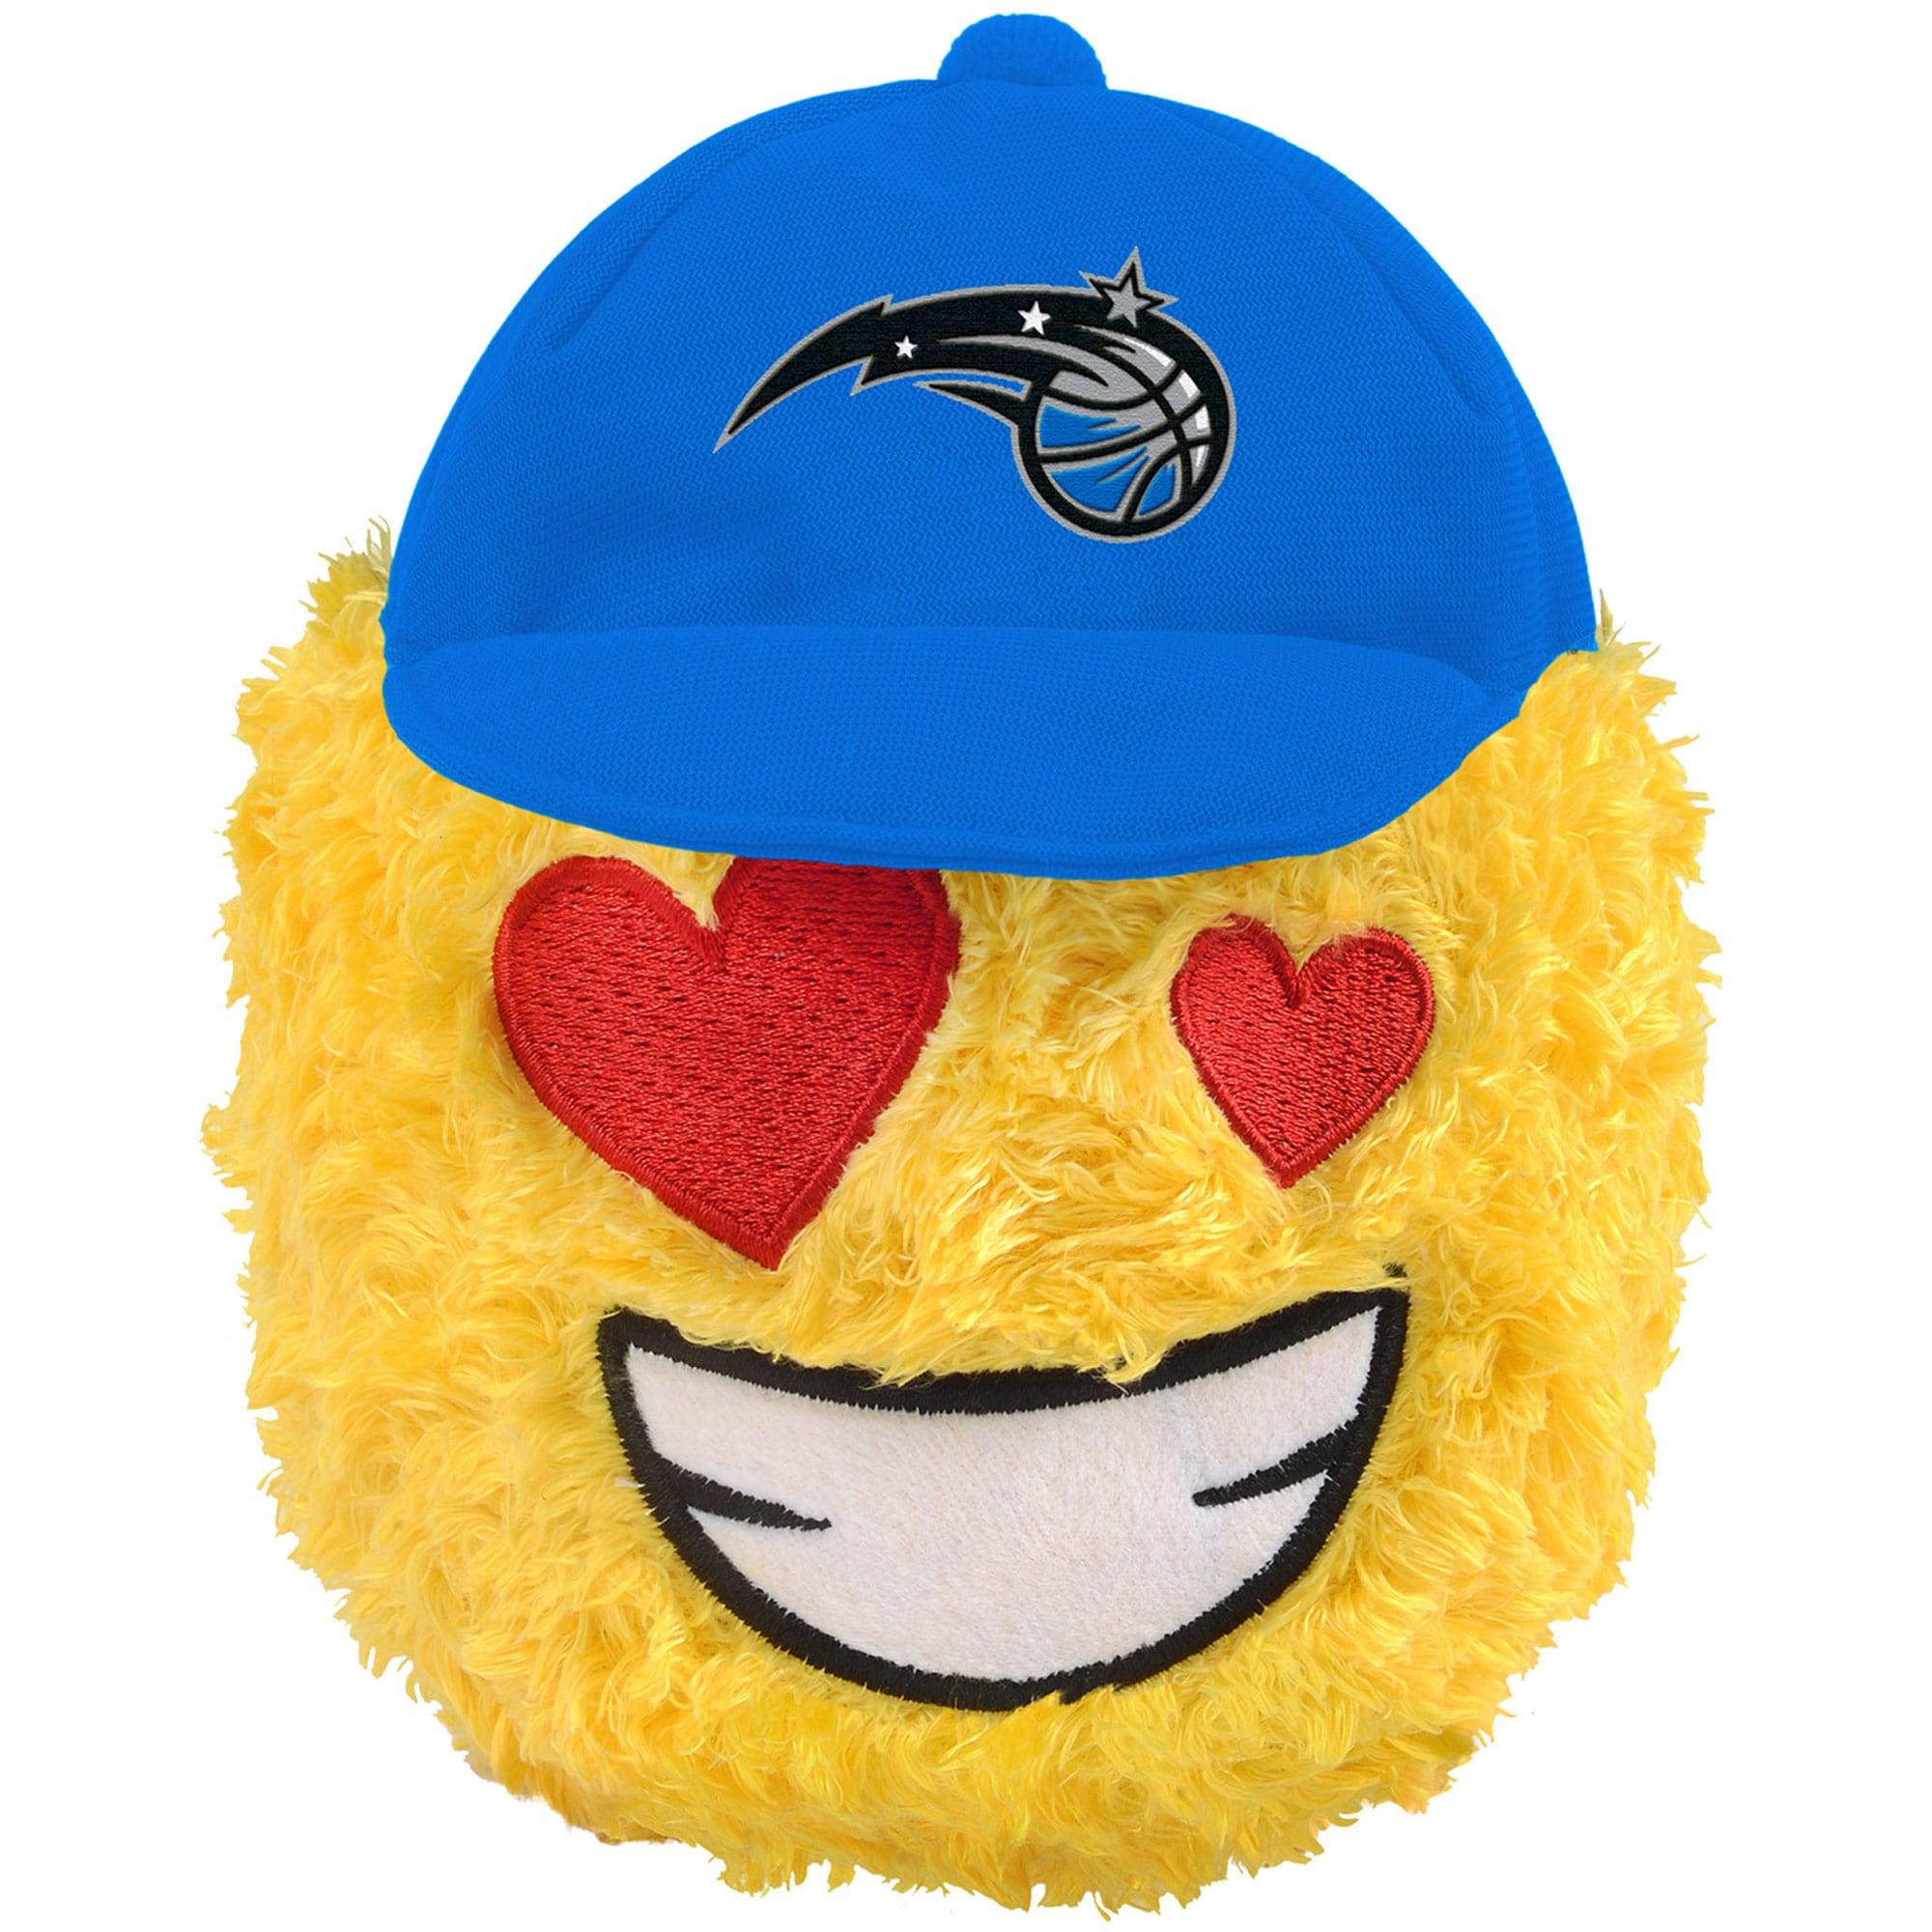 "Orlando Magic 5"" Heart Eyes Teamoji Plush Toy"